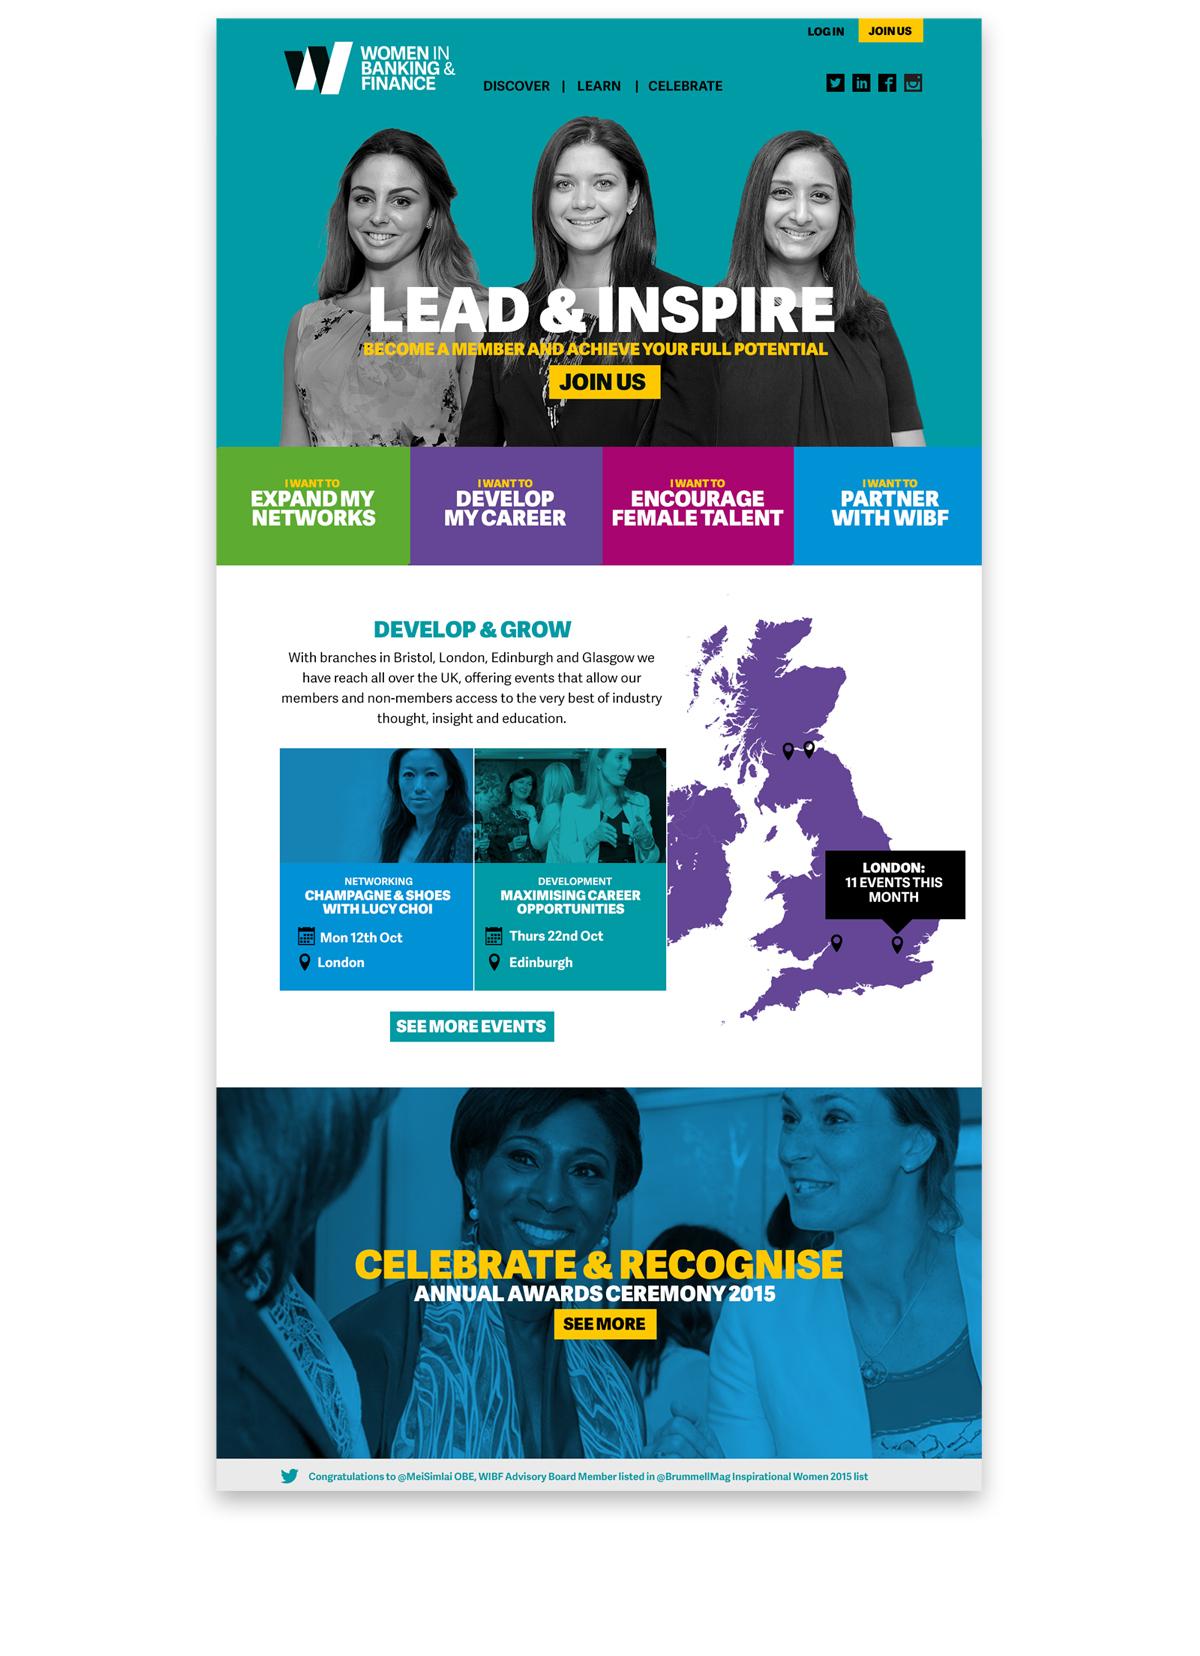 Homepage visual